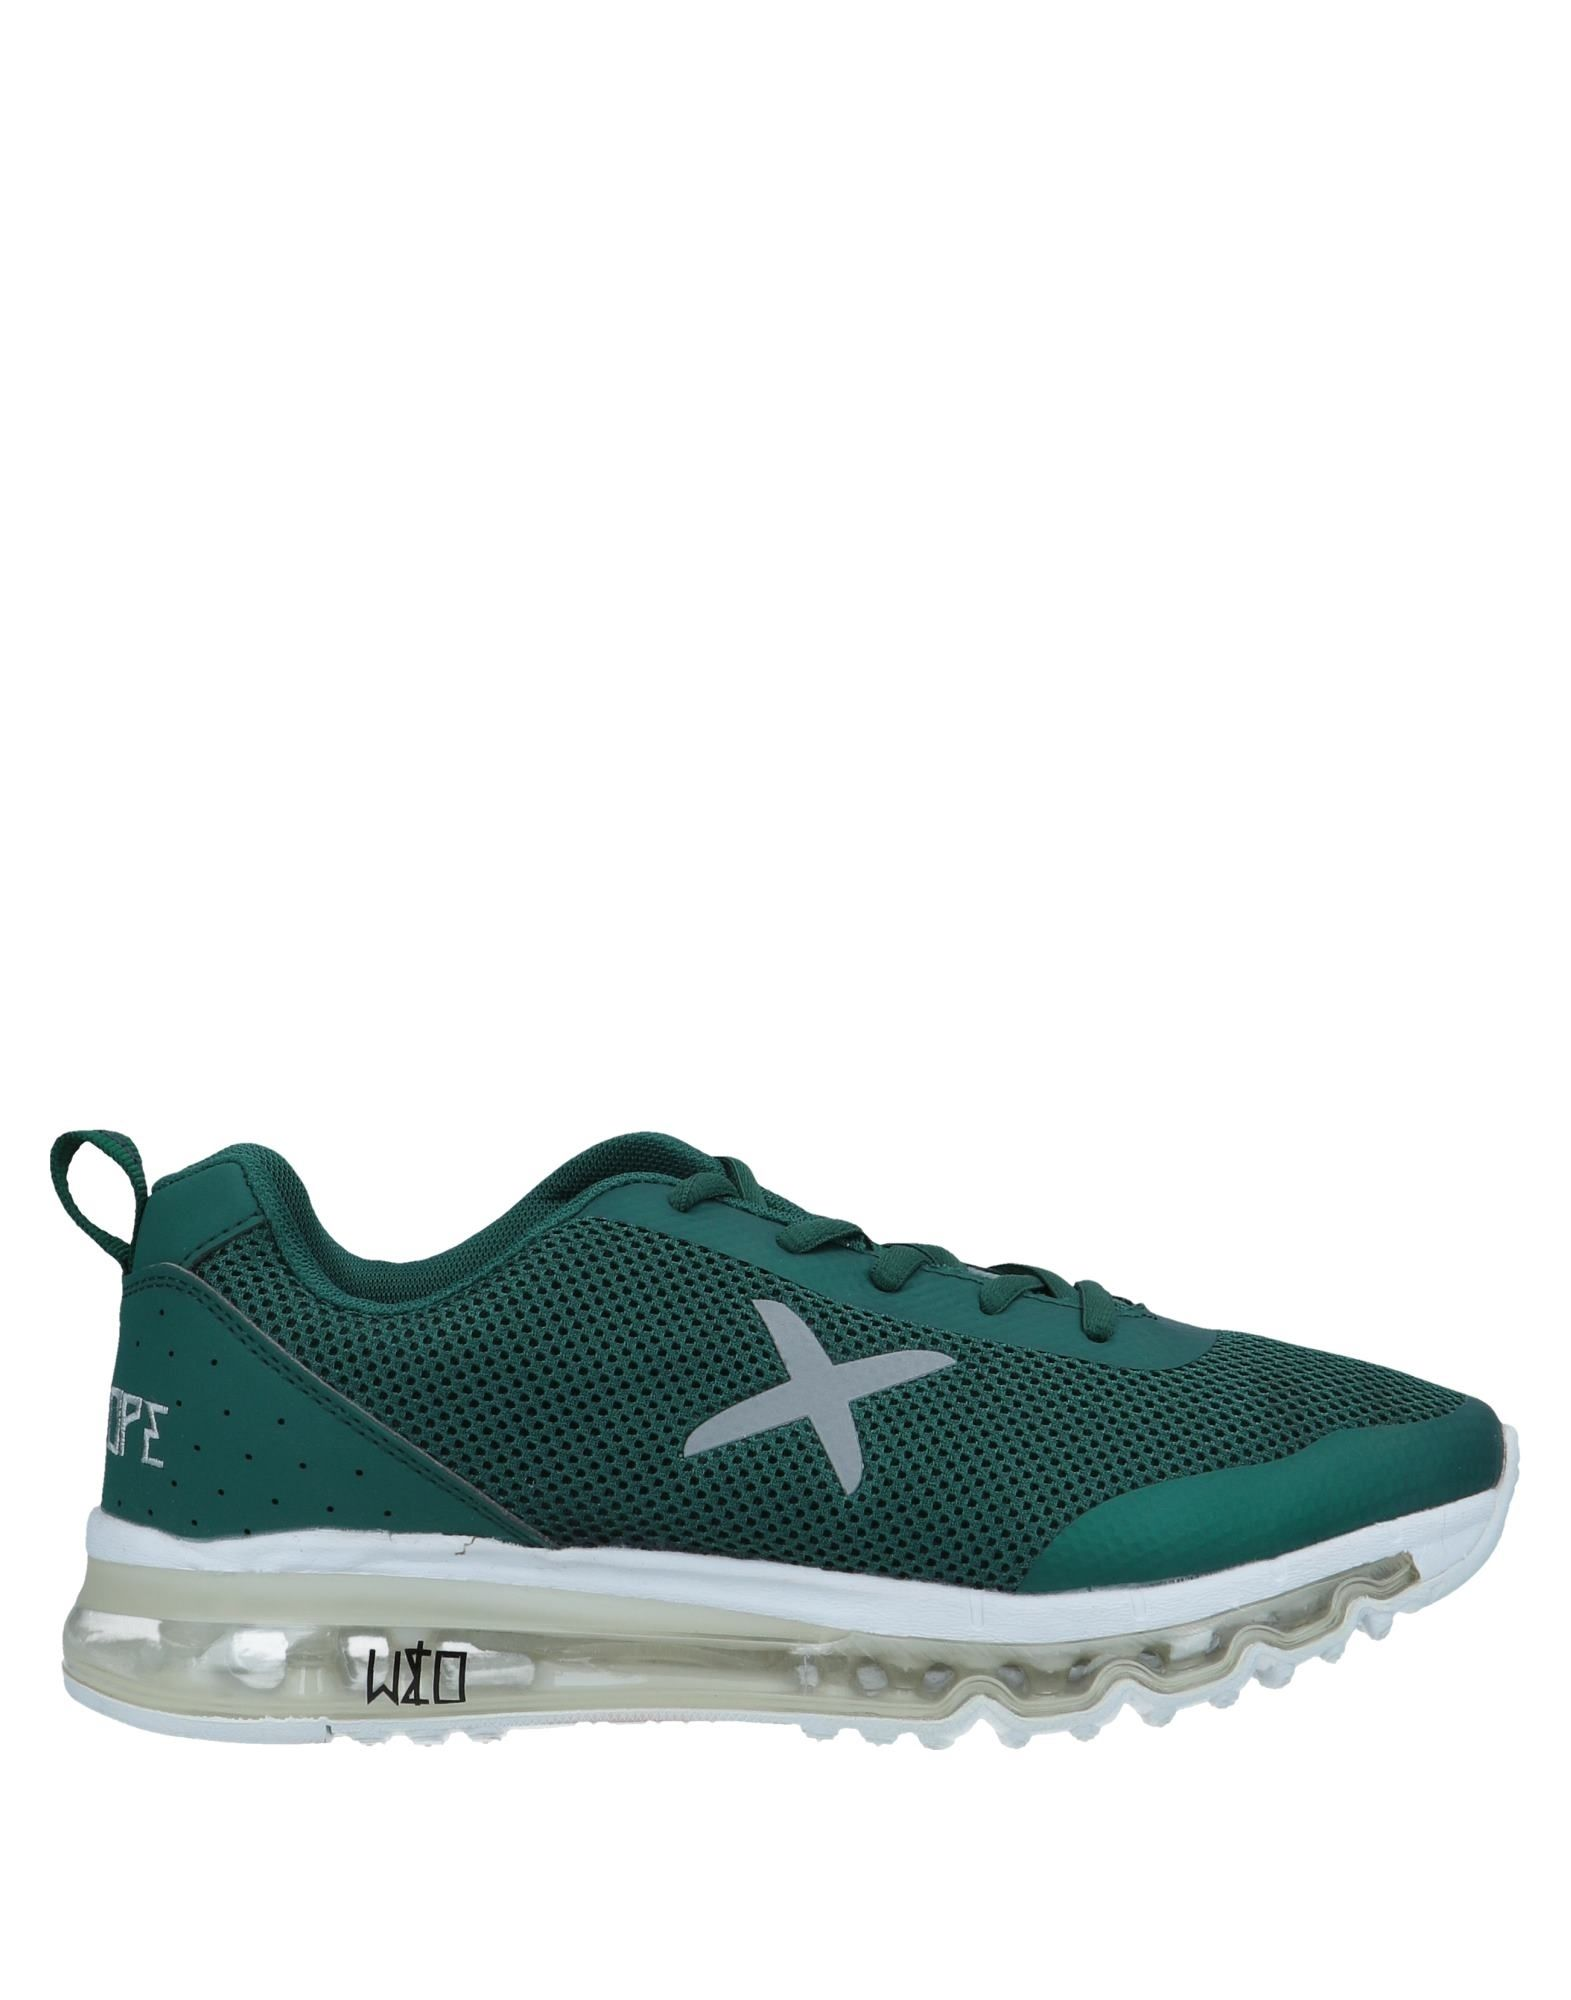 WIZE & OPE Sneakers in Green